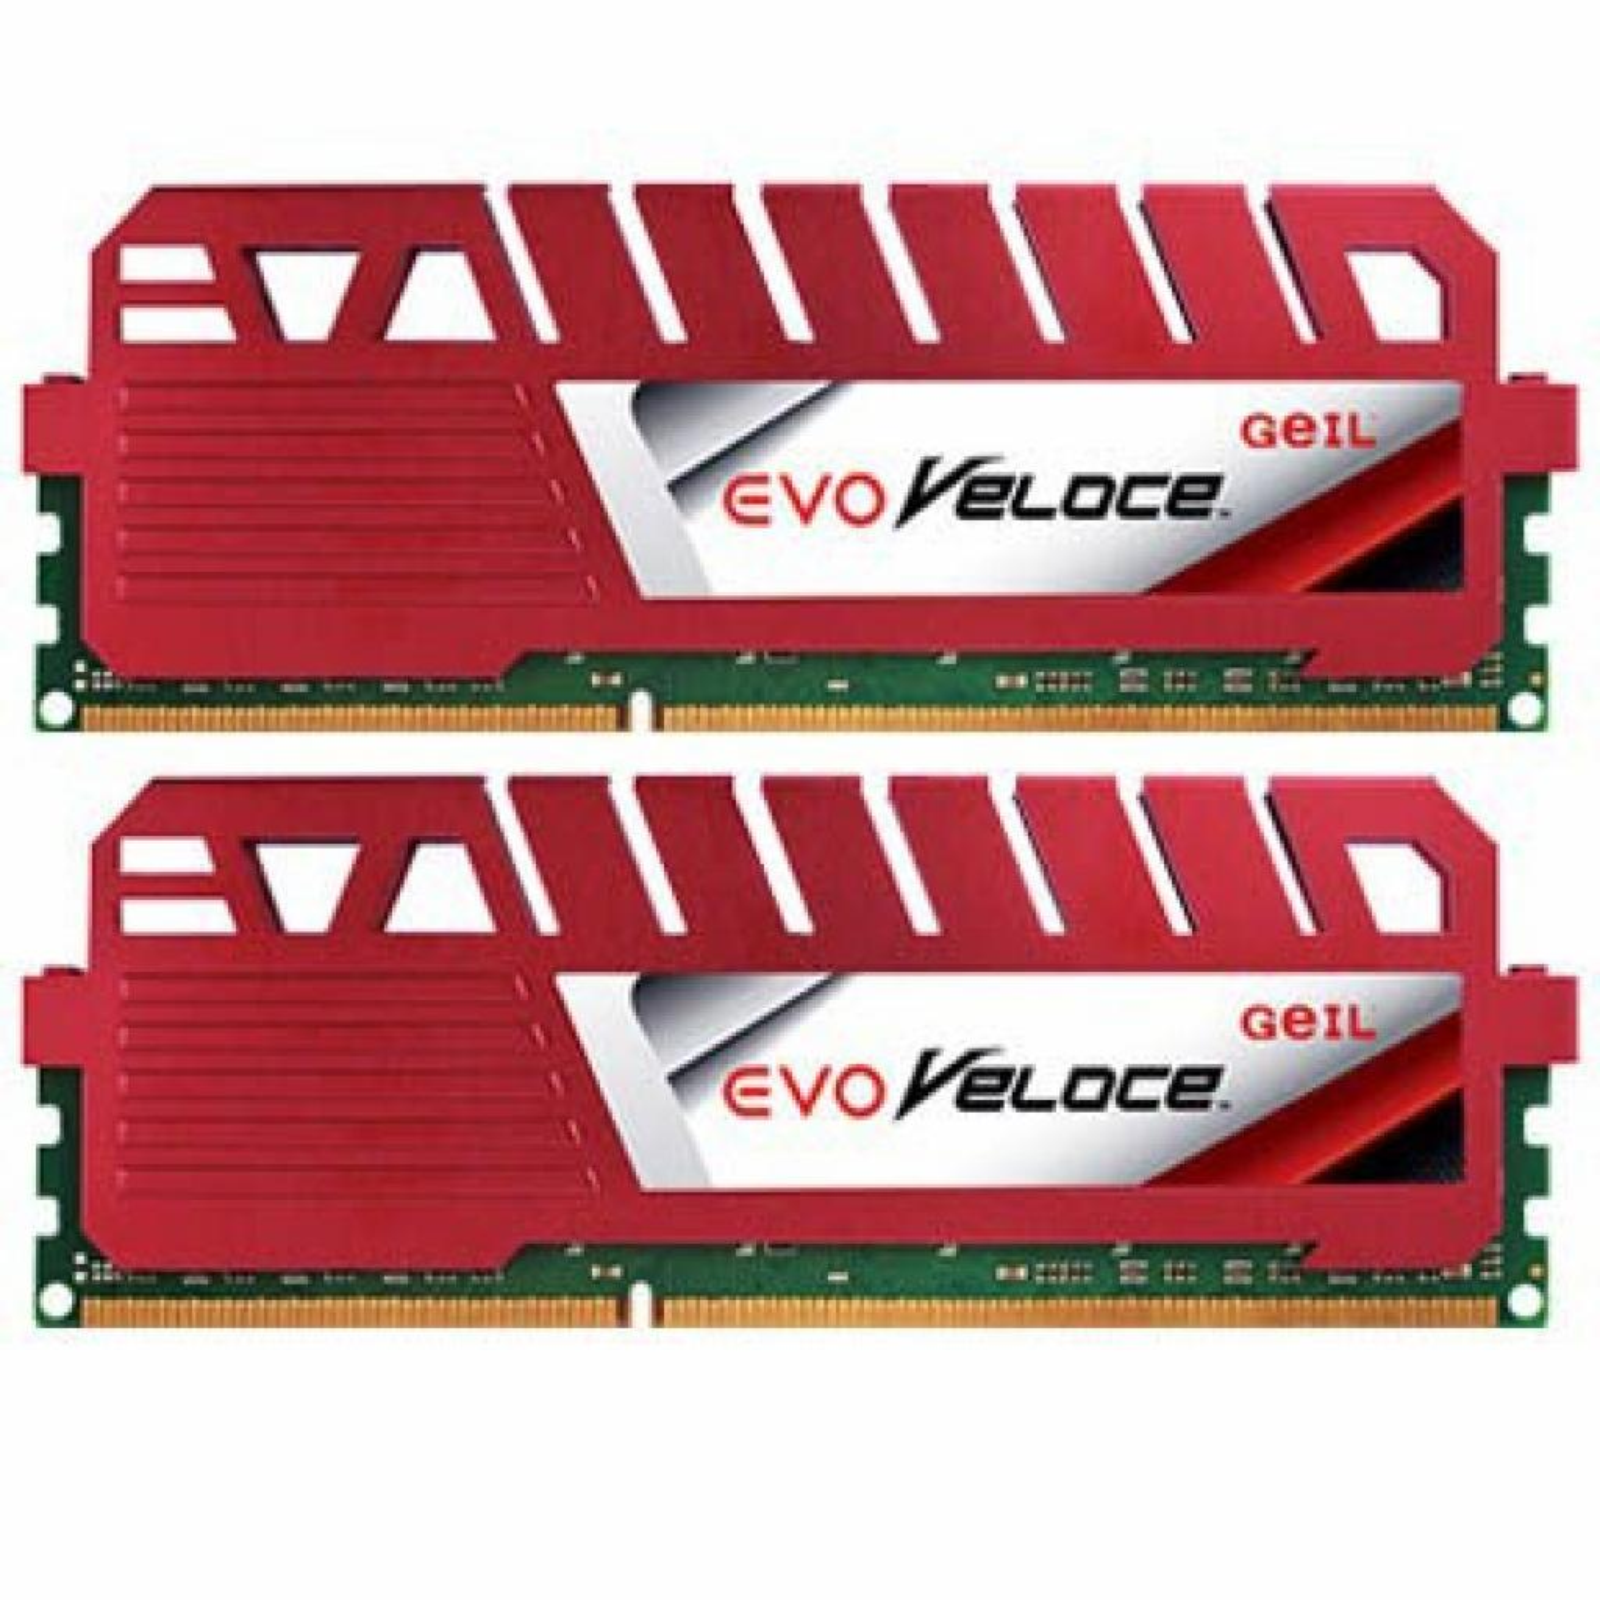 Модуль памяти для компьютера DDR3 16GB (2x8GB) 1600 MHz GEIL (GEV316GB1600C10DC)